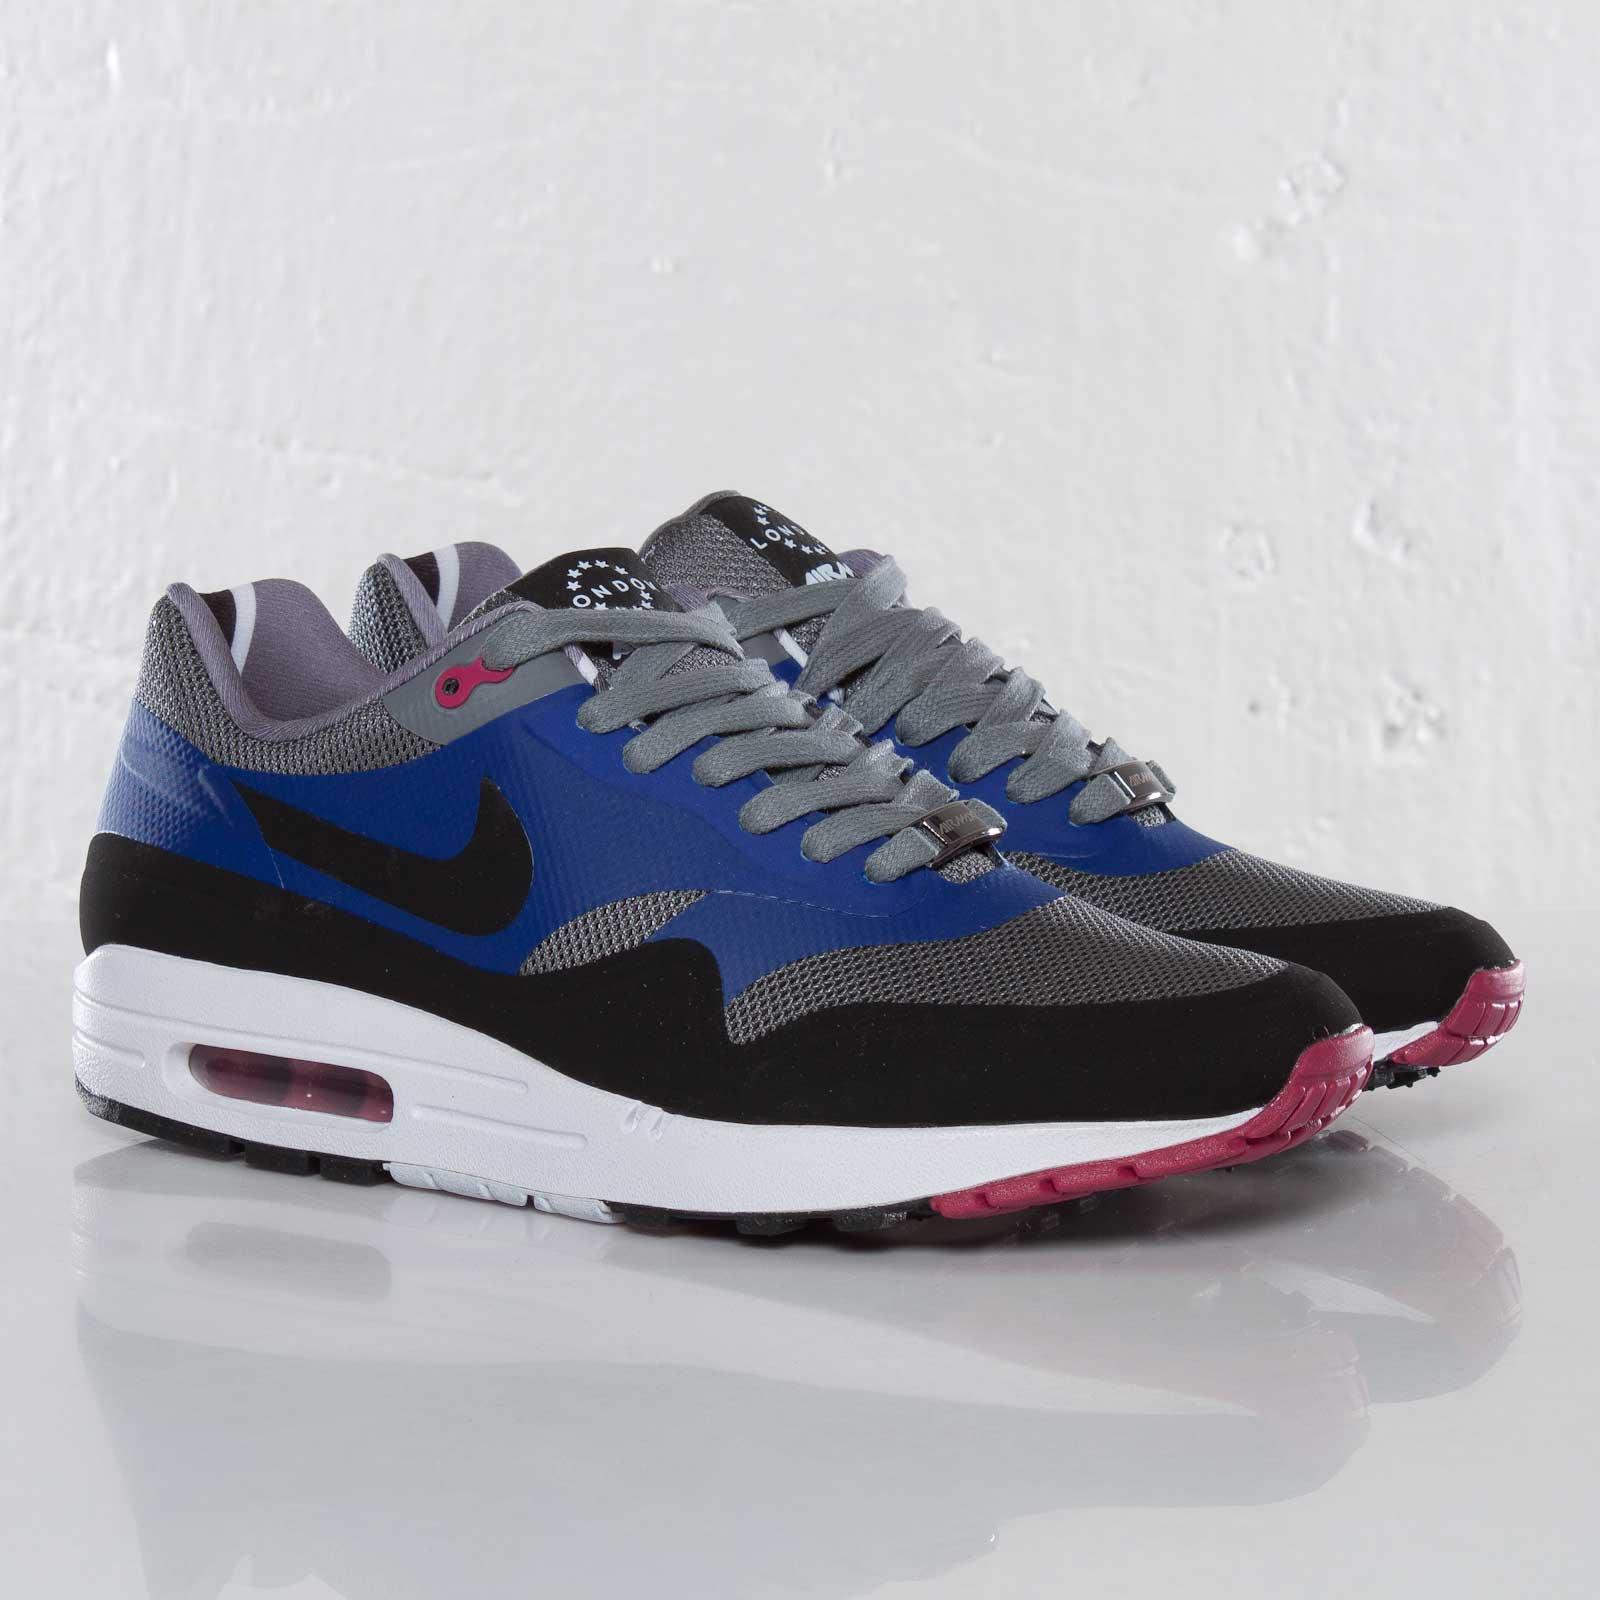 NIKE Shoes Nike Air Max 1 Qs London EnglandFärg: Svart Nike Air Max 1 Qs London England Color: Black